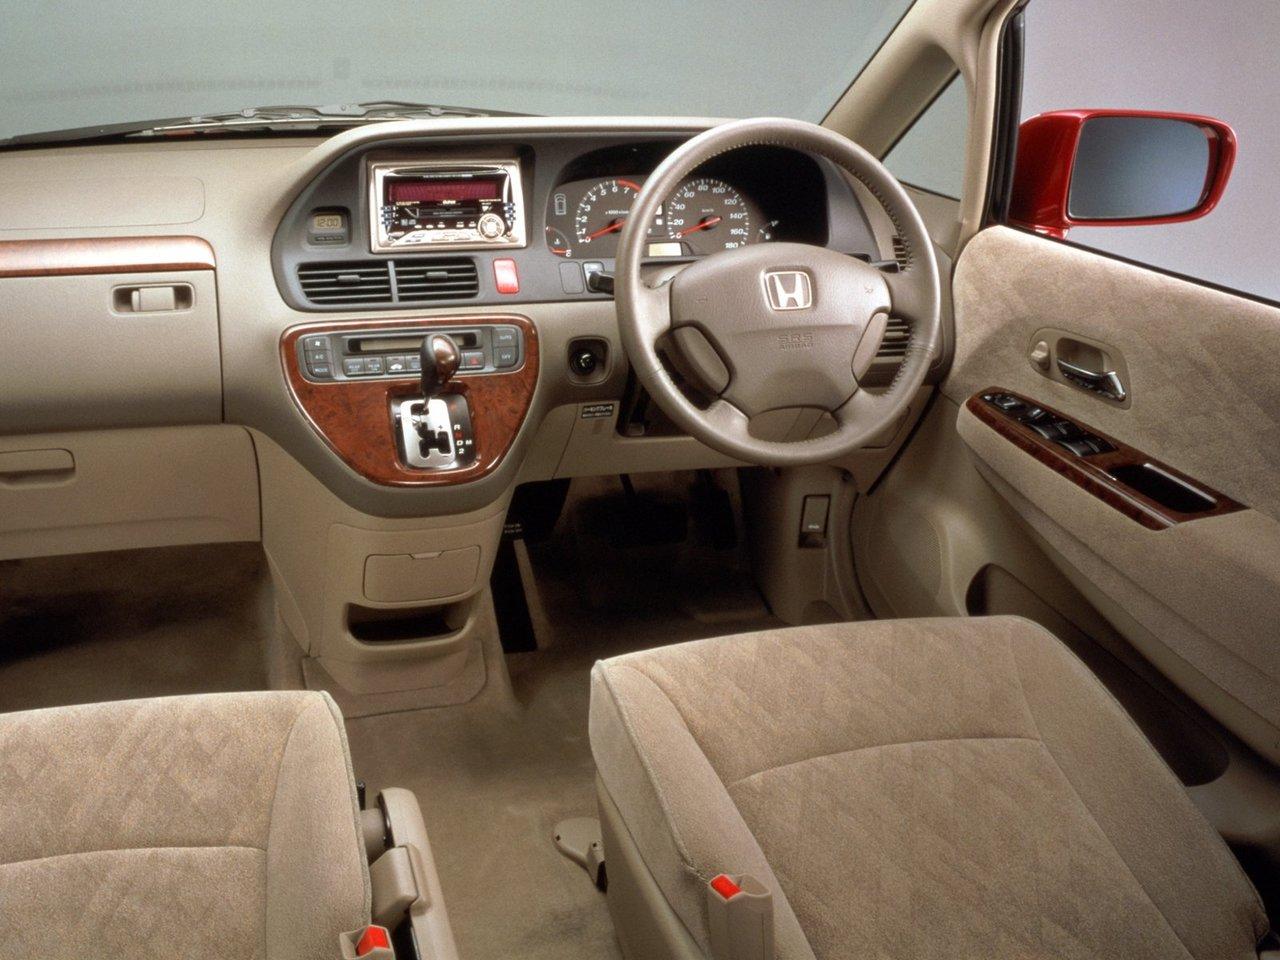 Honda Odyssey interior